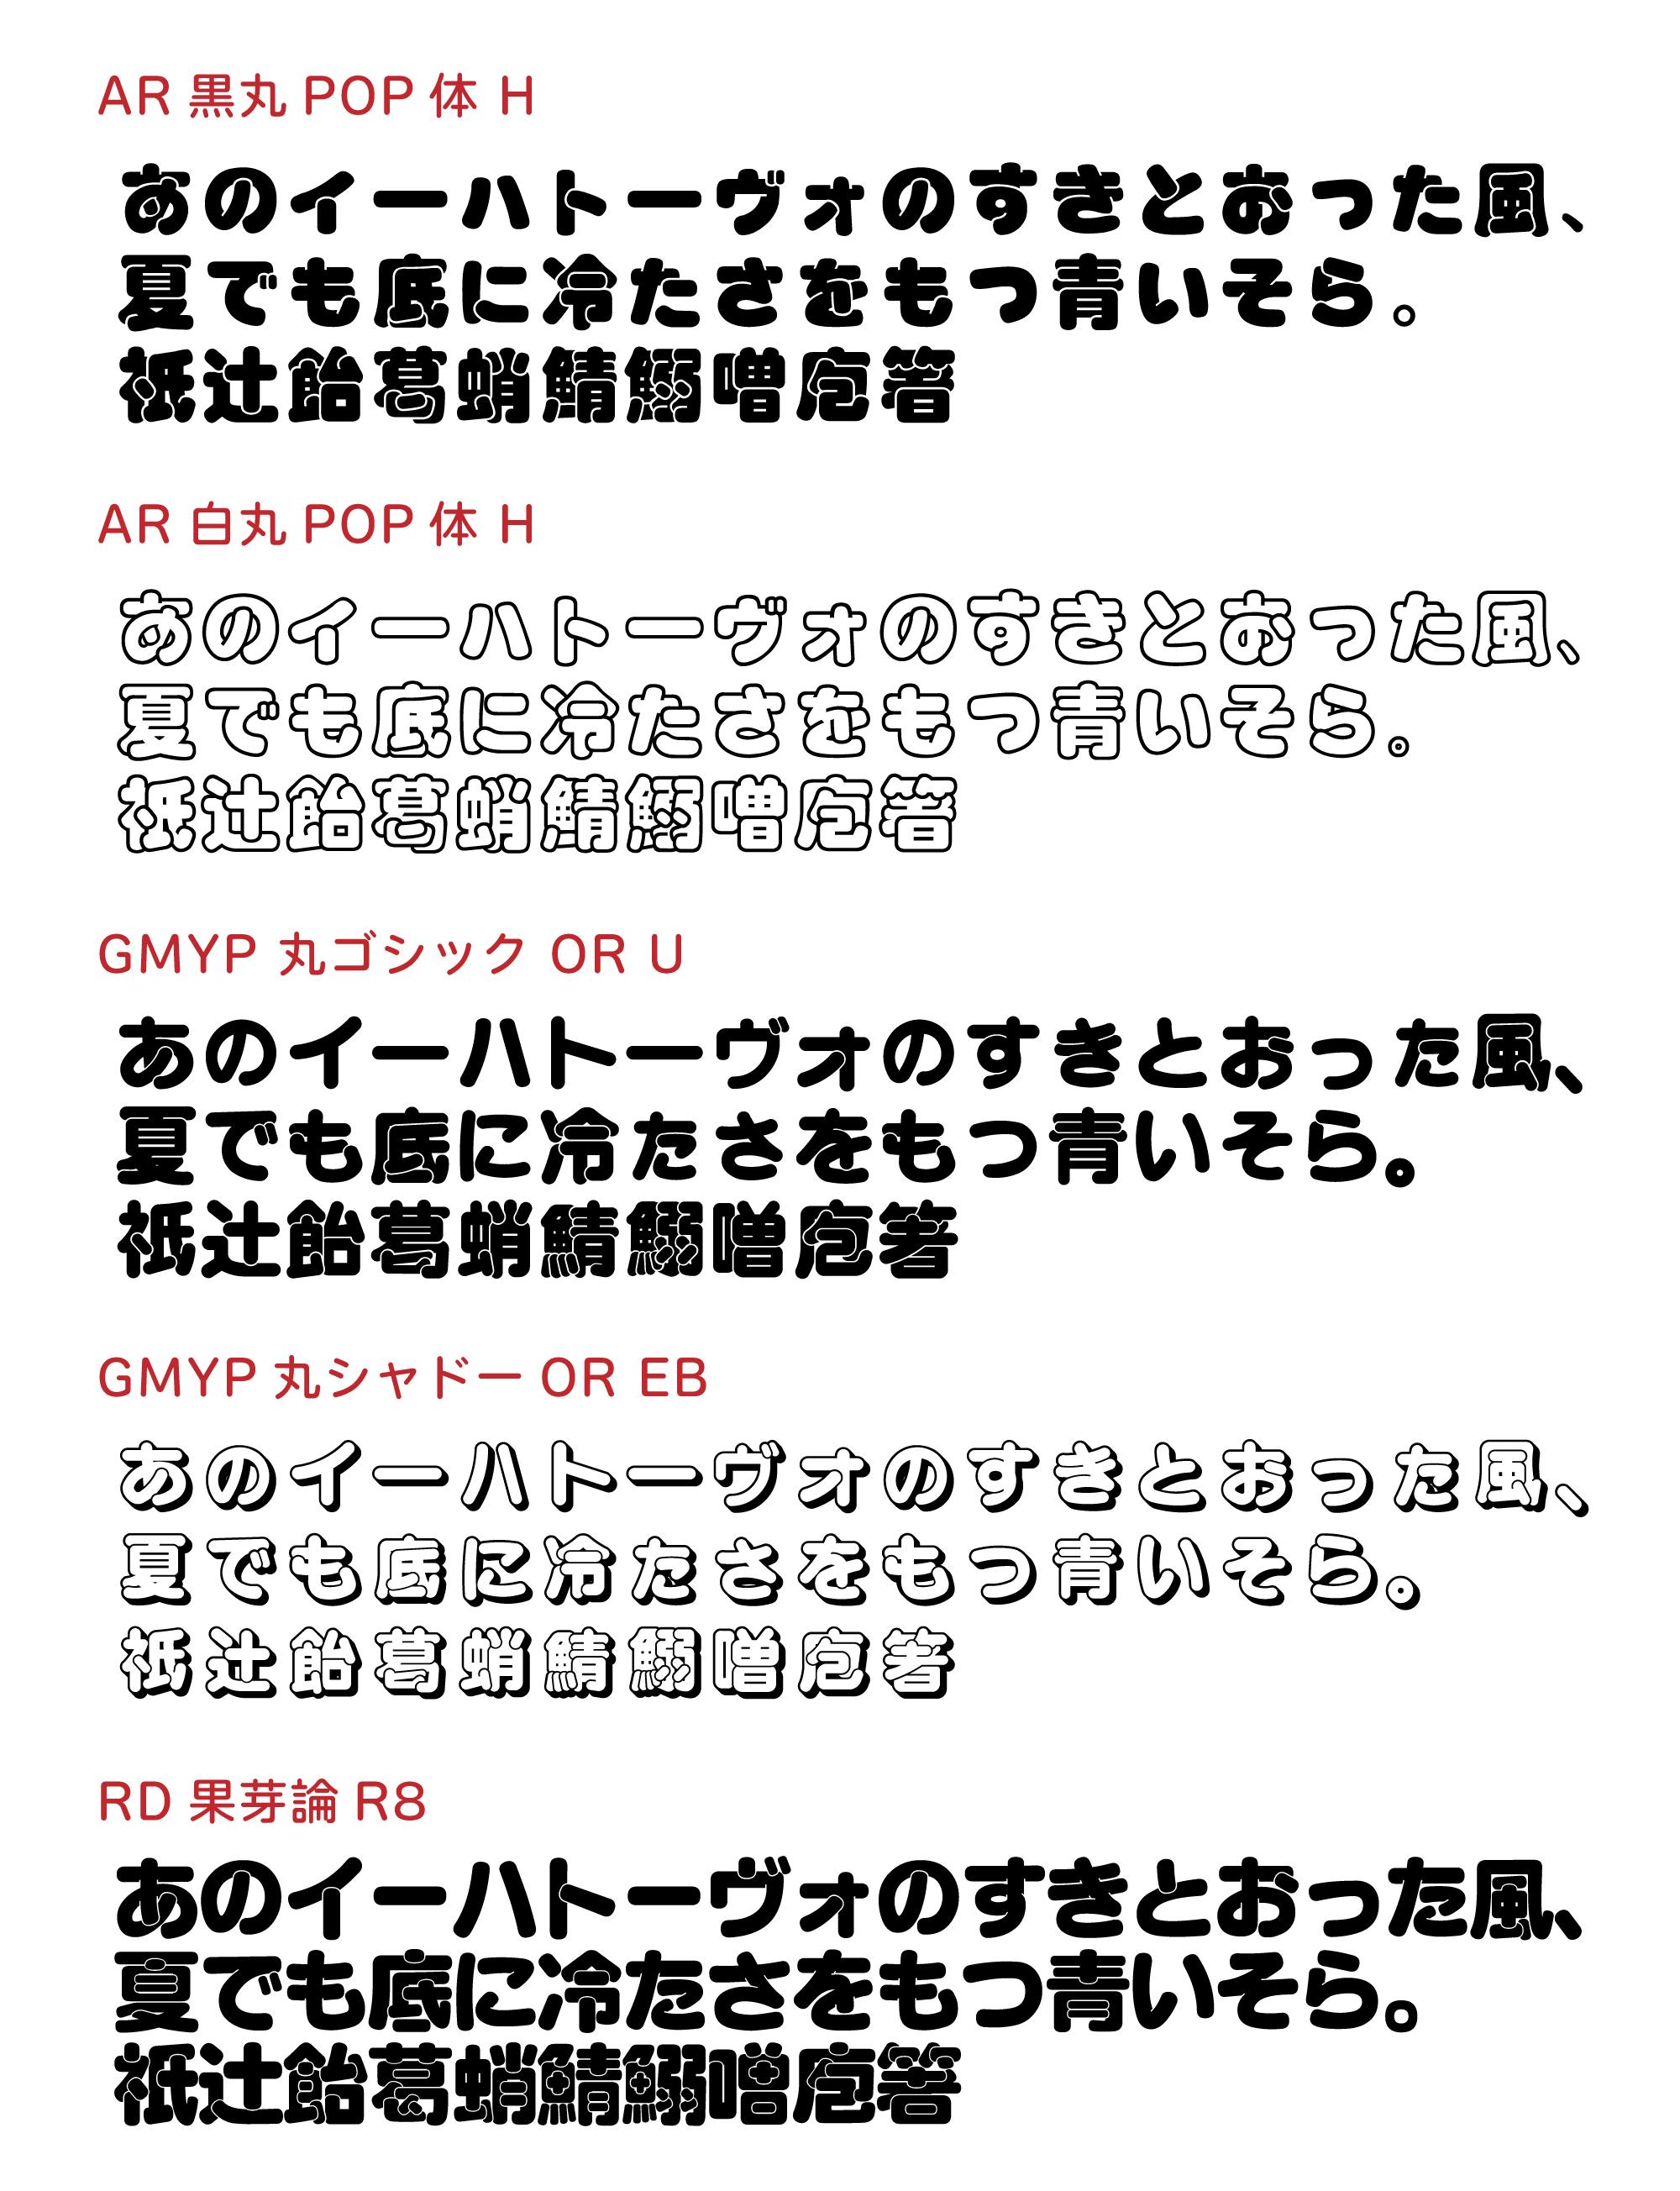 SuuboKeiFont.jpg